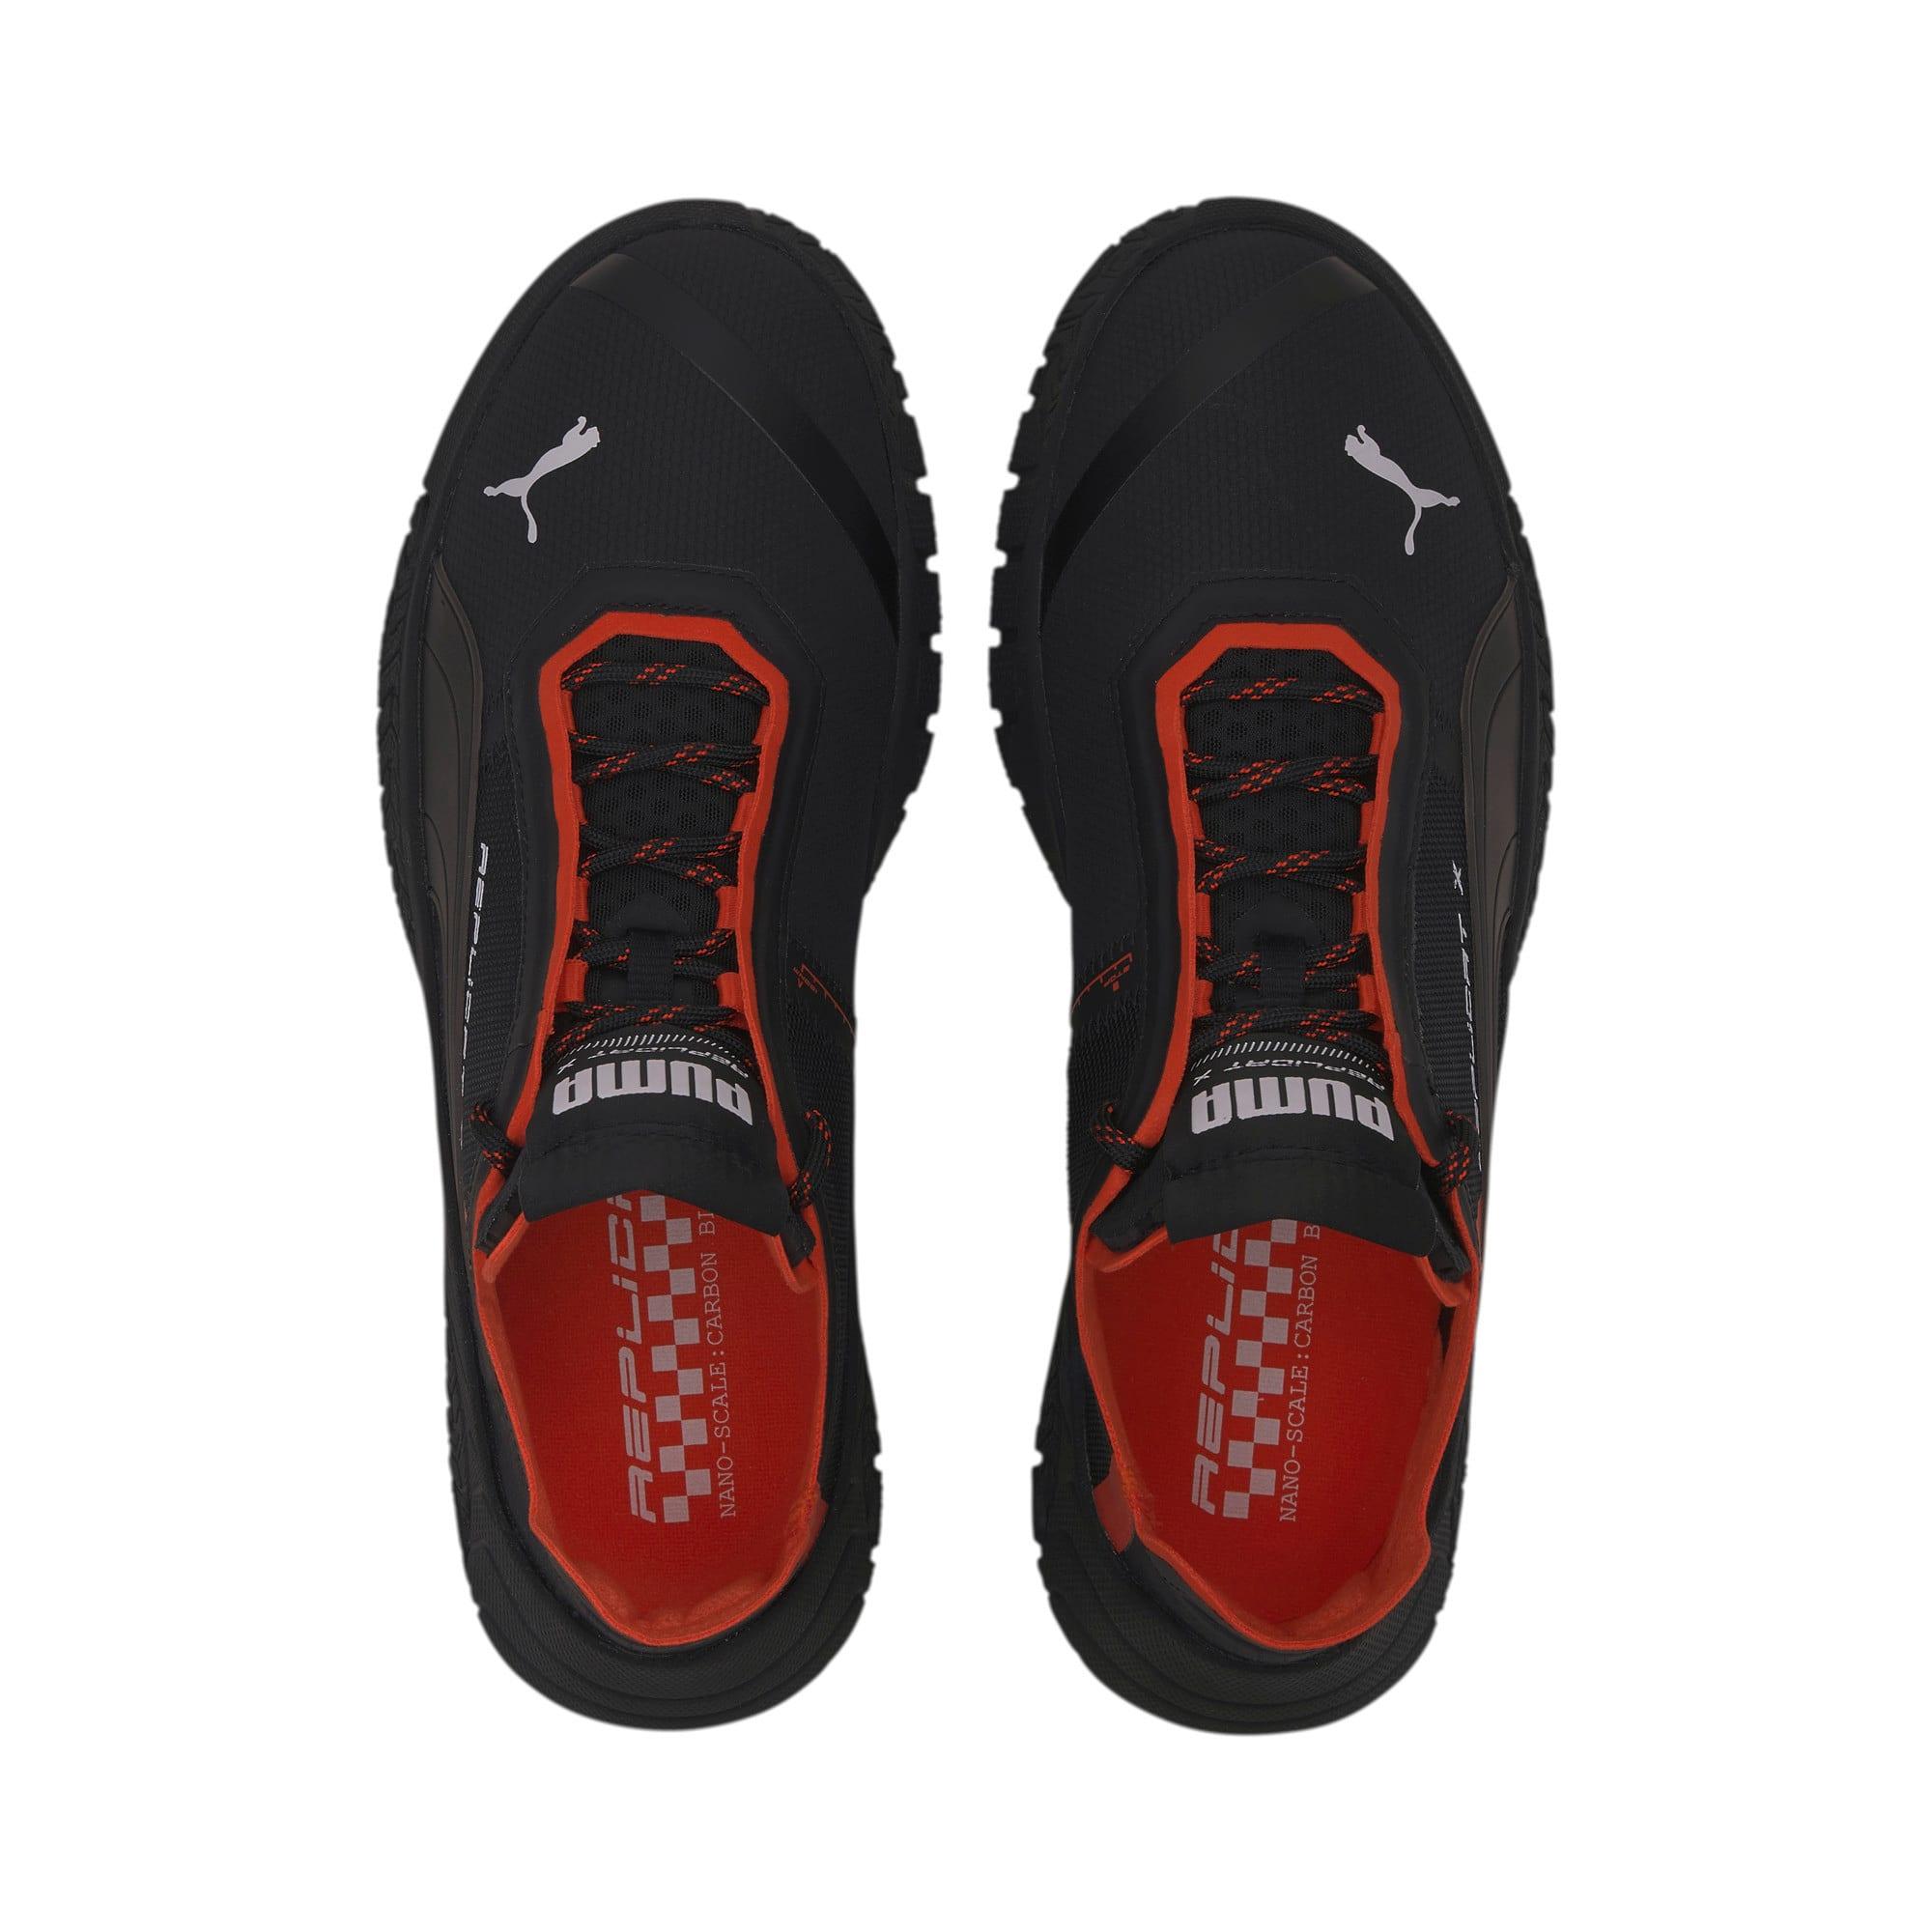 Thumbnail 6 of Replicat-X Circuit Motorsport Shoes, Puma Black-Puma Red, medium